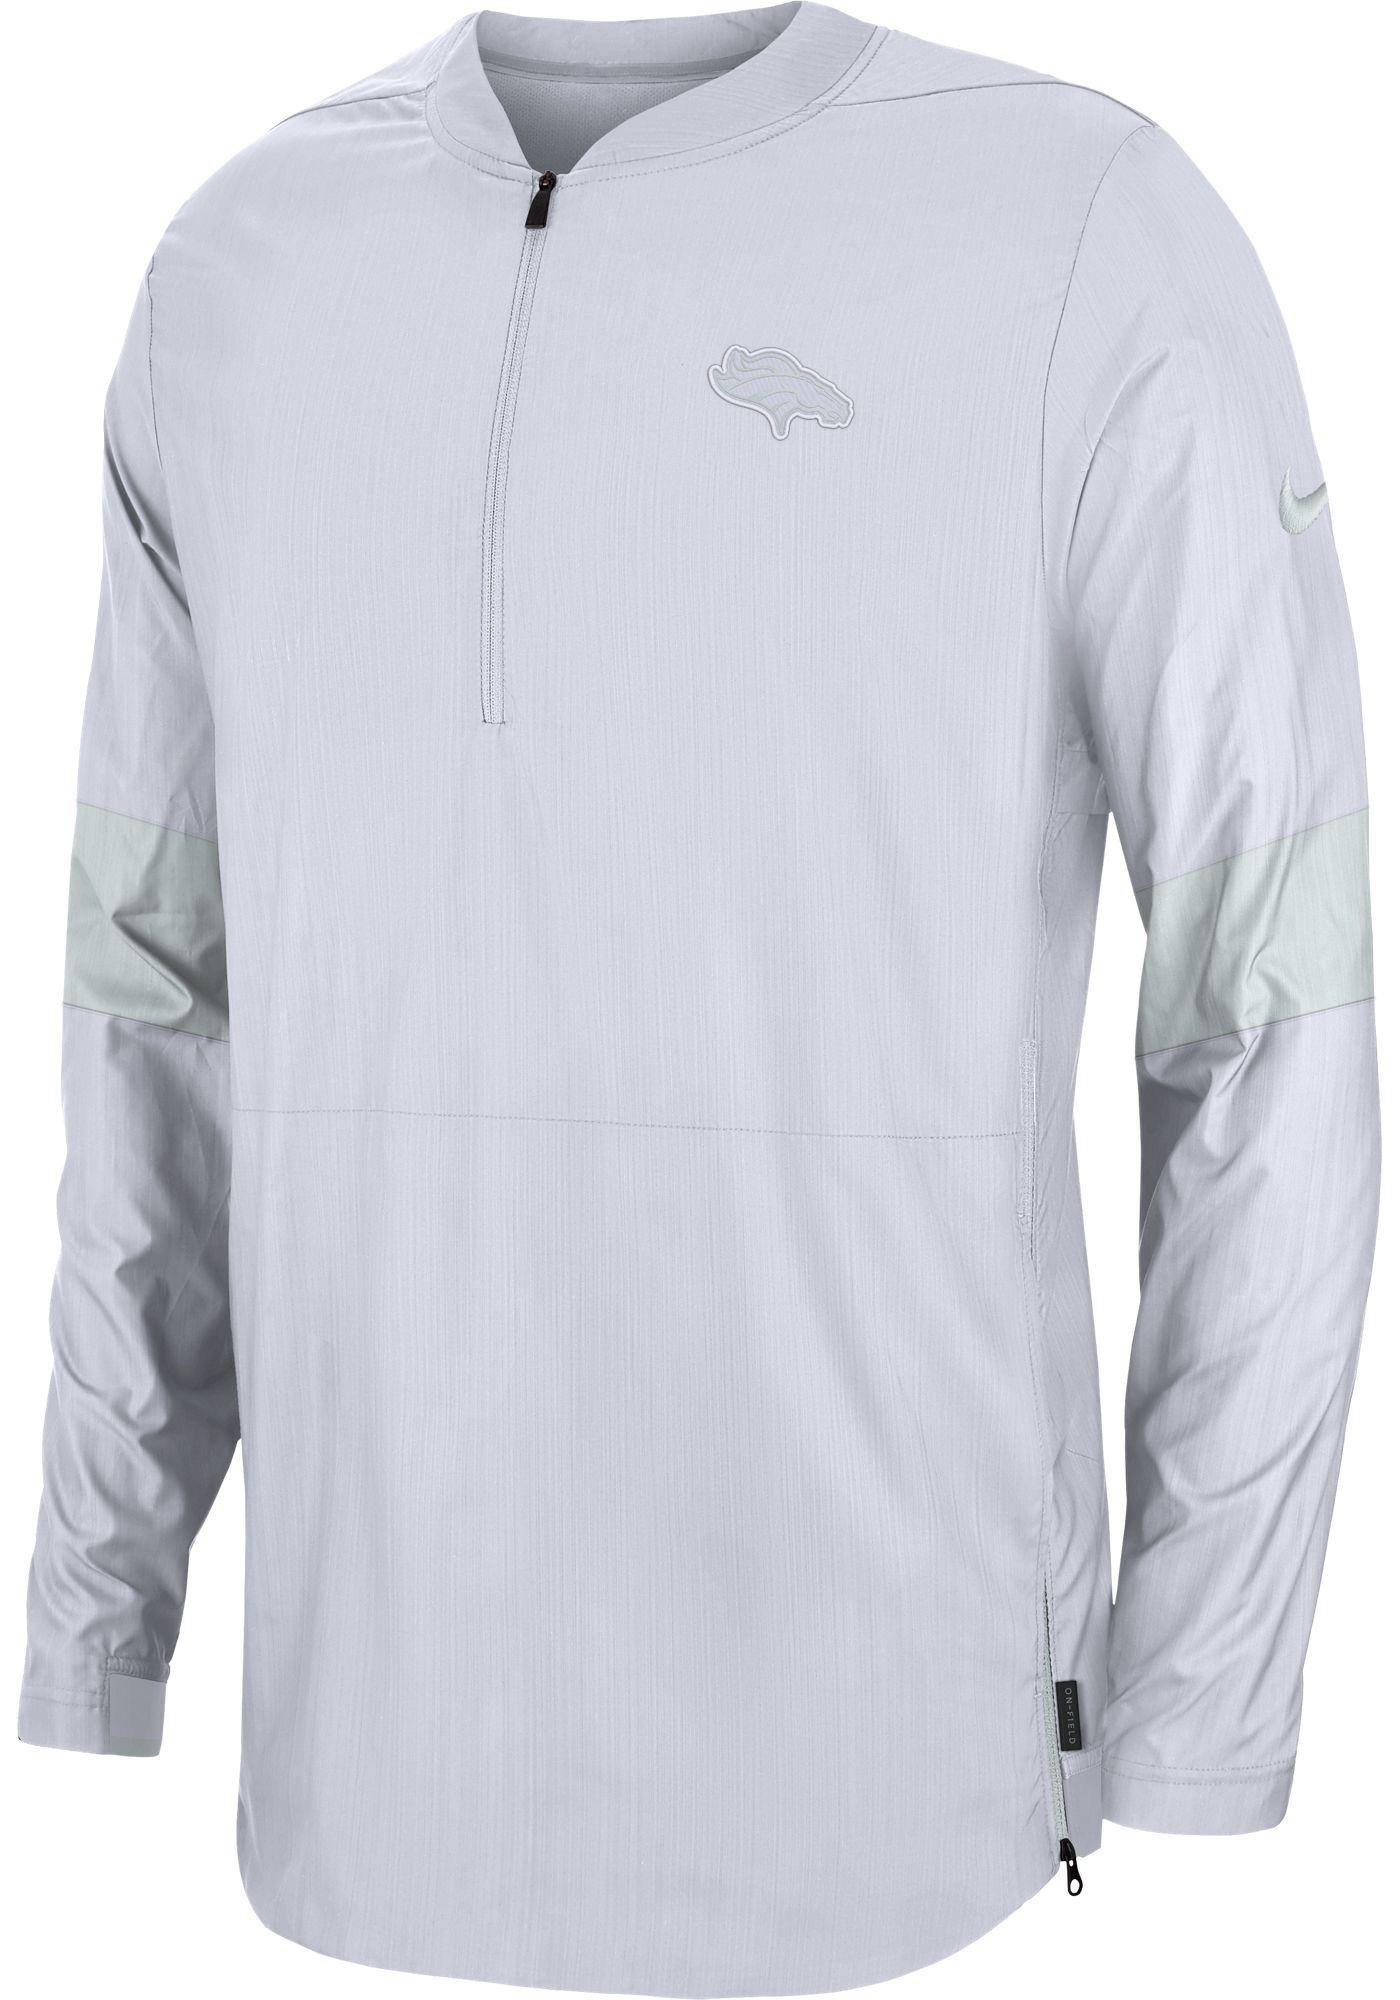 Nike Men's Denver Broncos Sideline Coach White Half-Zip Performance Jacket